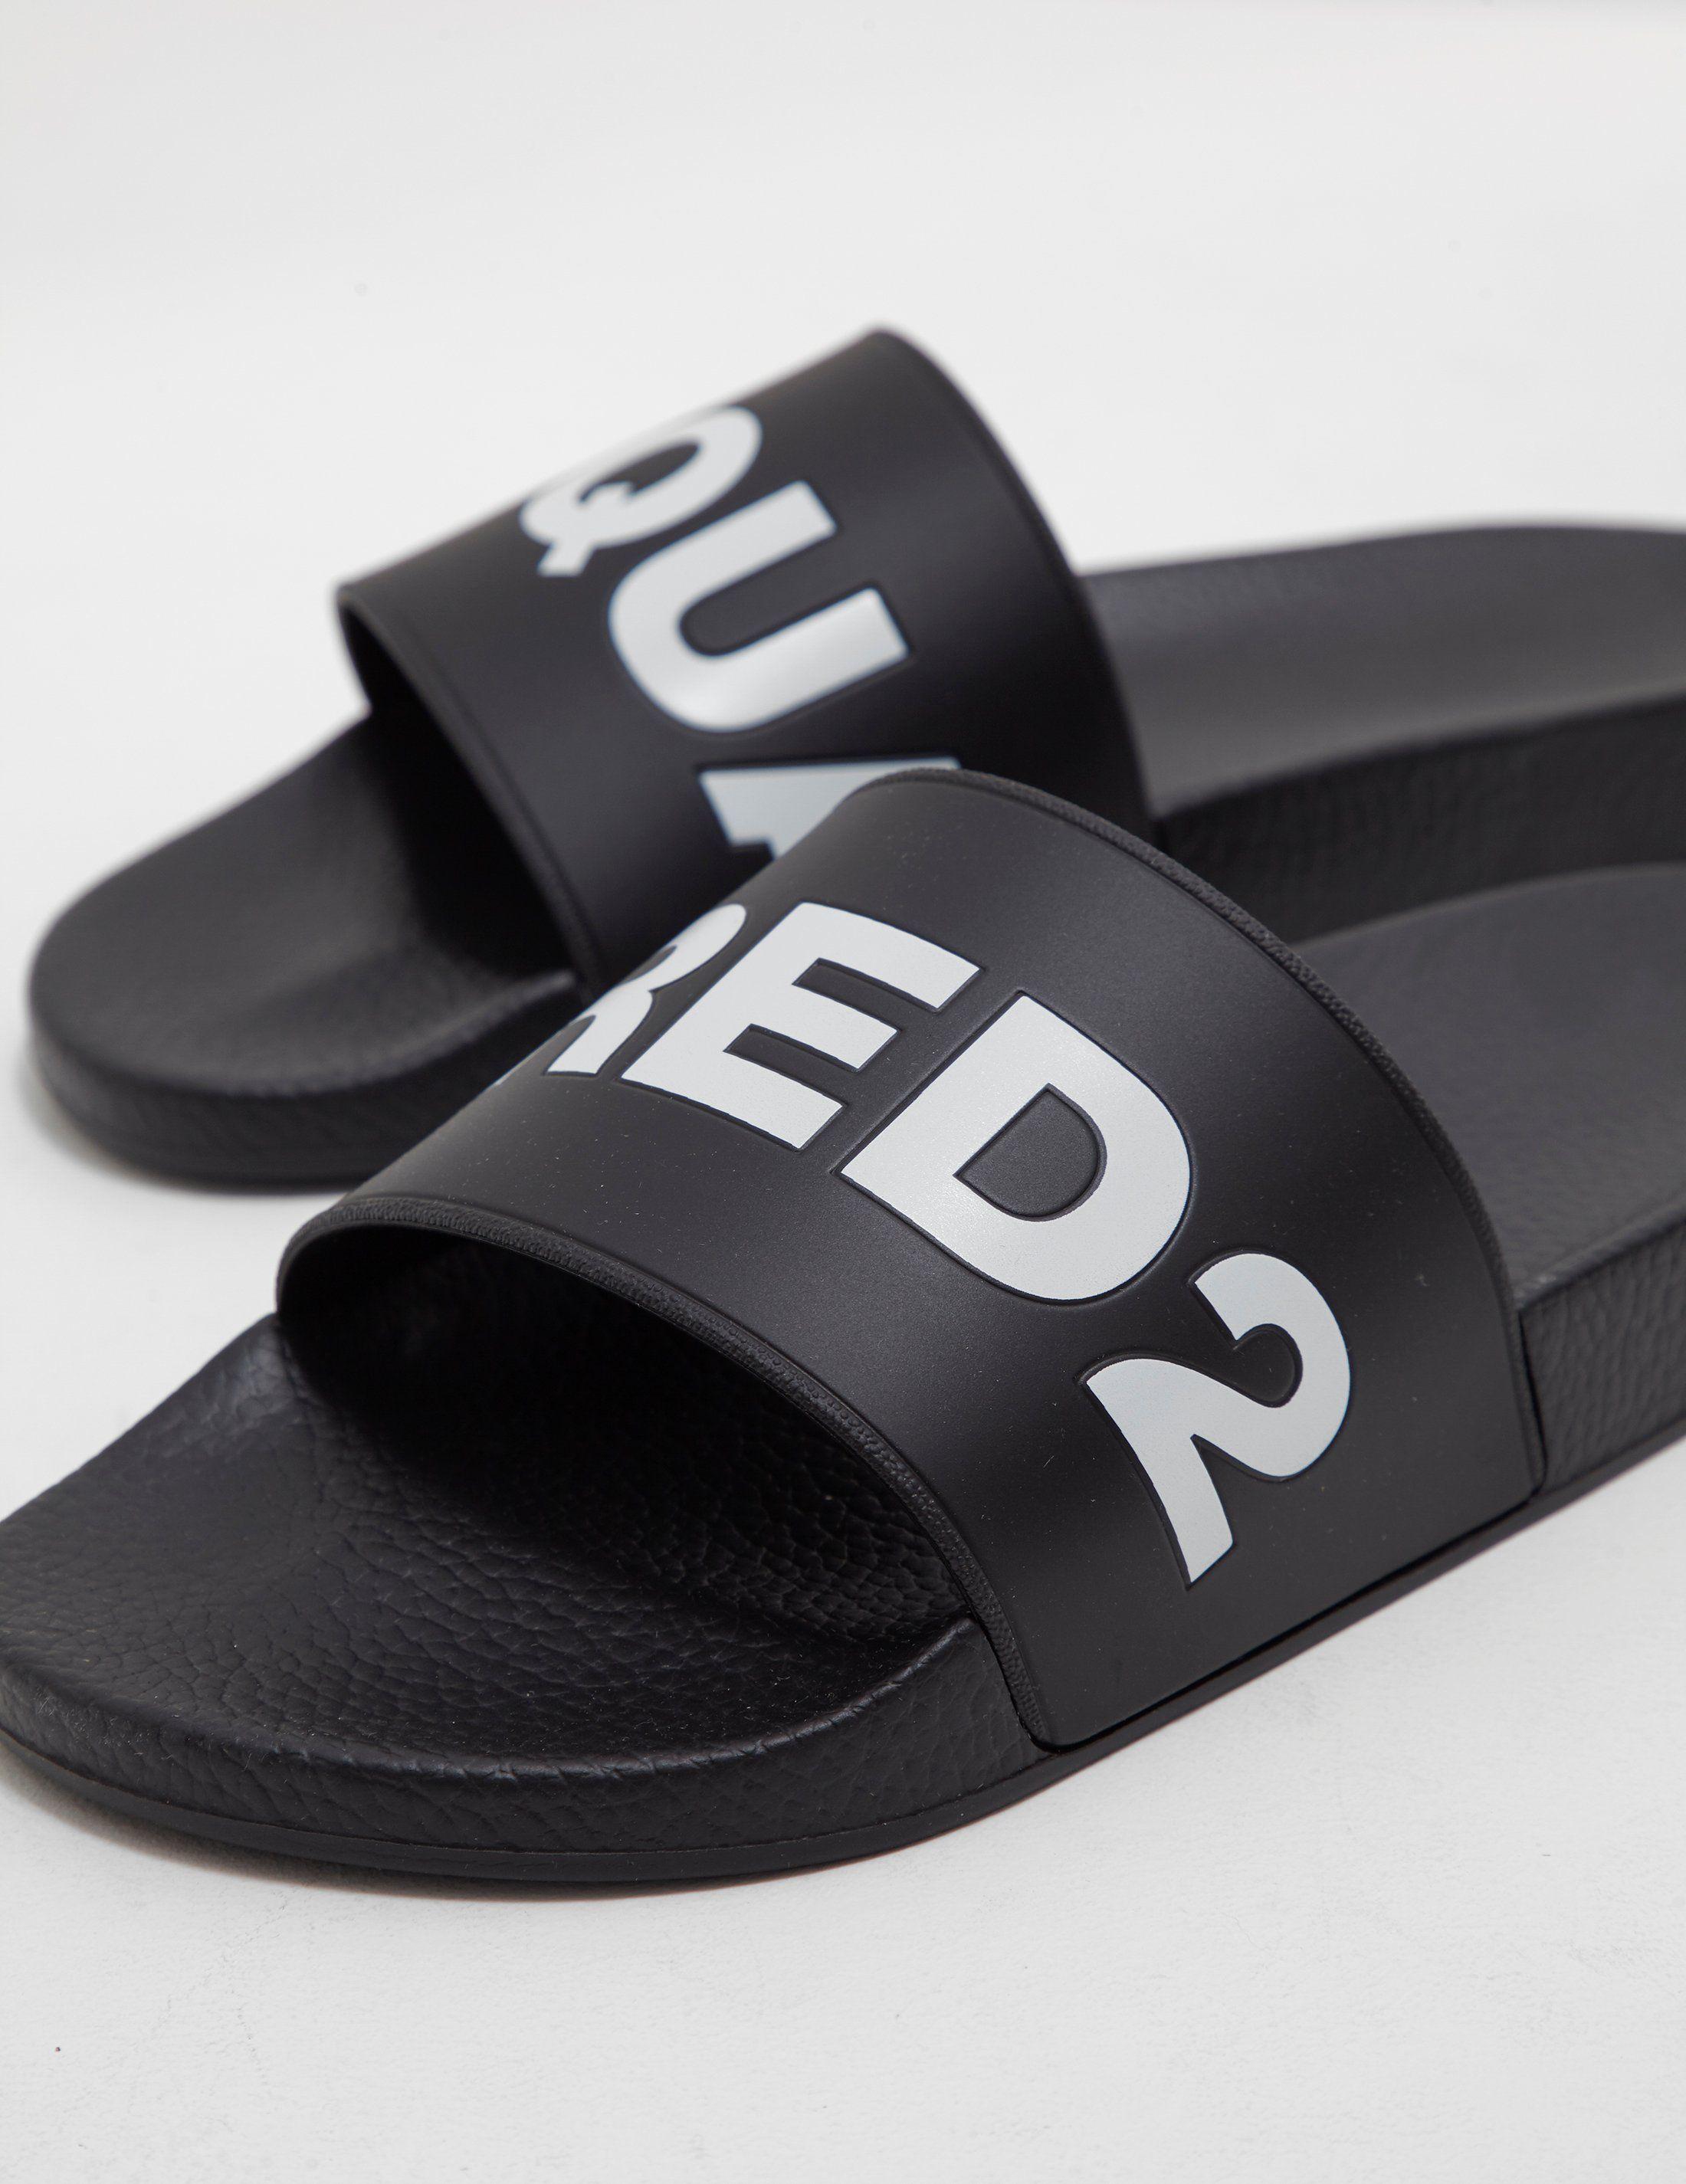 DSQUARED2 Slides